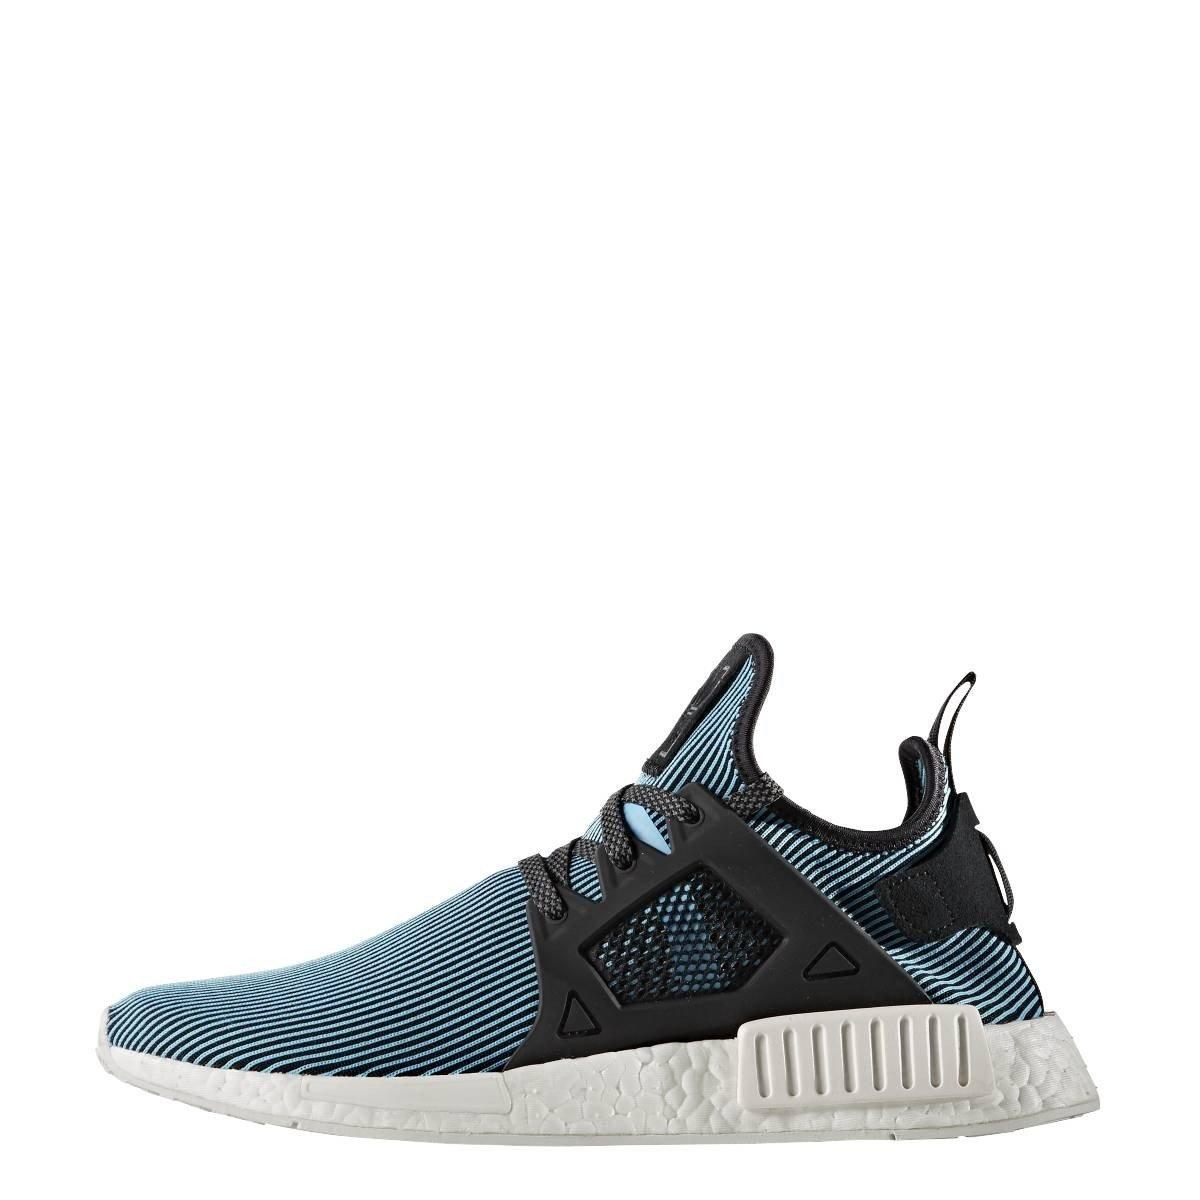 Adidas -Blau Originals Herren NMD_XR1 PK Turnschuhe Schuhe -Blau Adidas 47f597